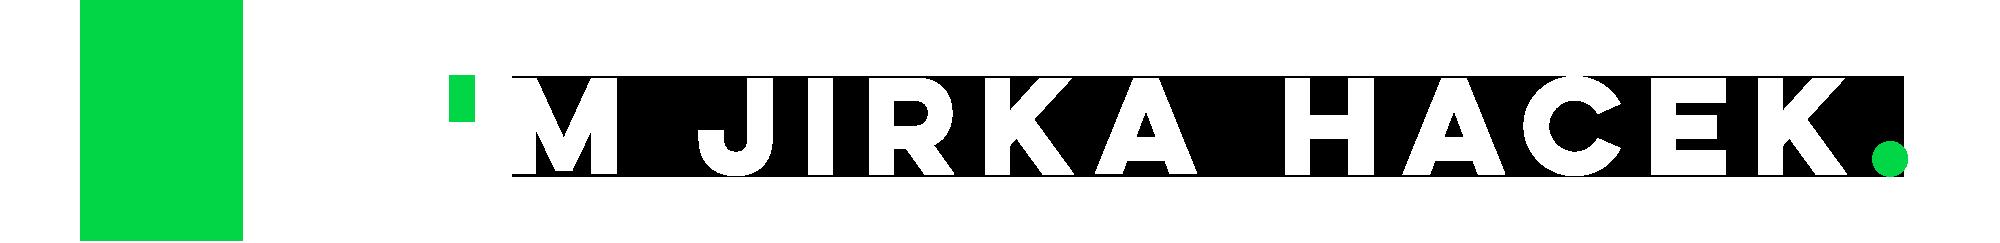 I'm Jirka Hacek.